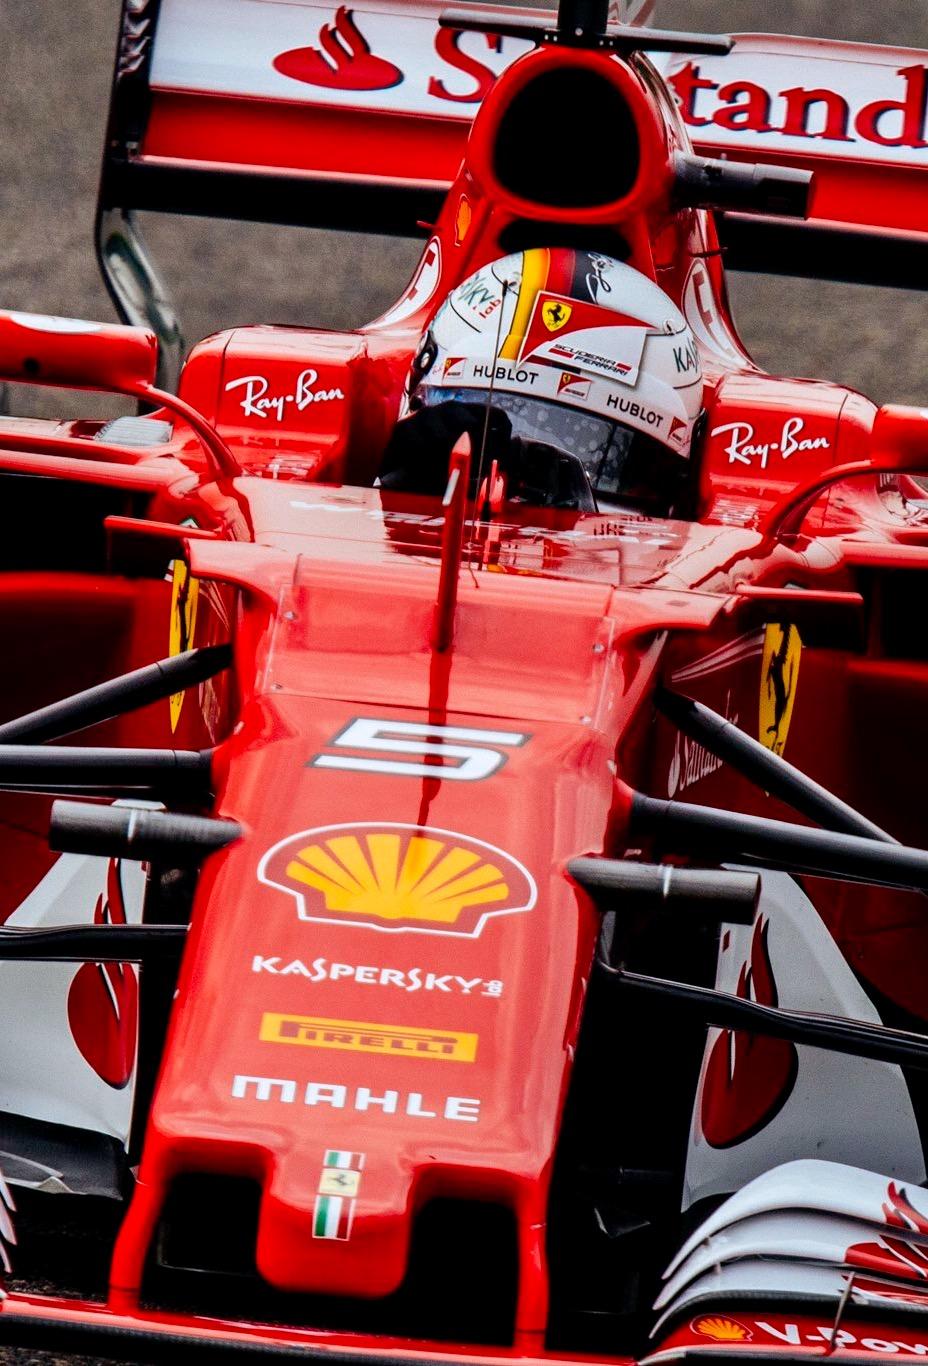 Ferrari Sfh Twitter Scuderiaferrari Seb Passing Kimi Ferrari F1 2017 Wallpaper Phone 928x1366 Download Hd Wallpaper Wallpapertip